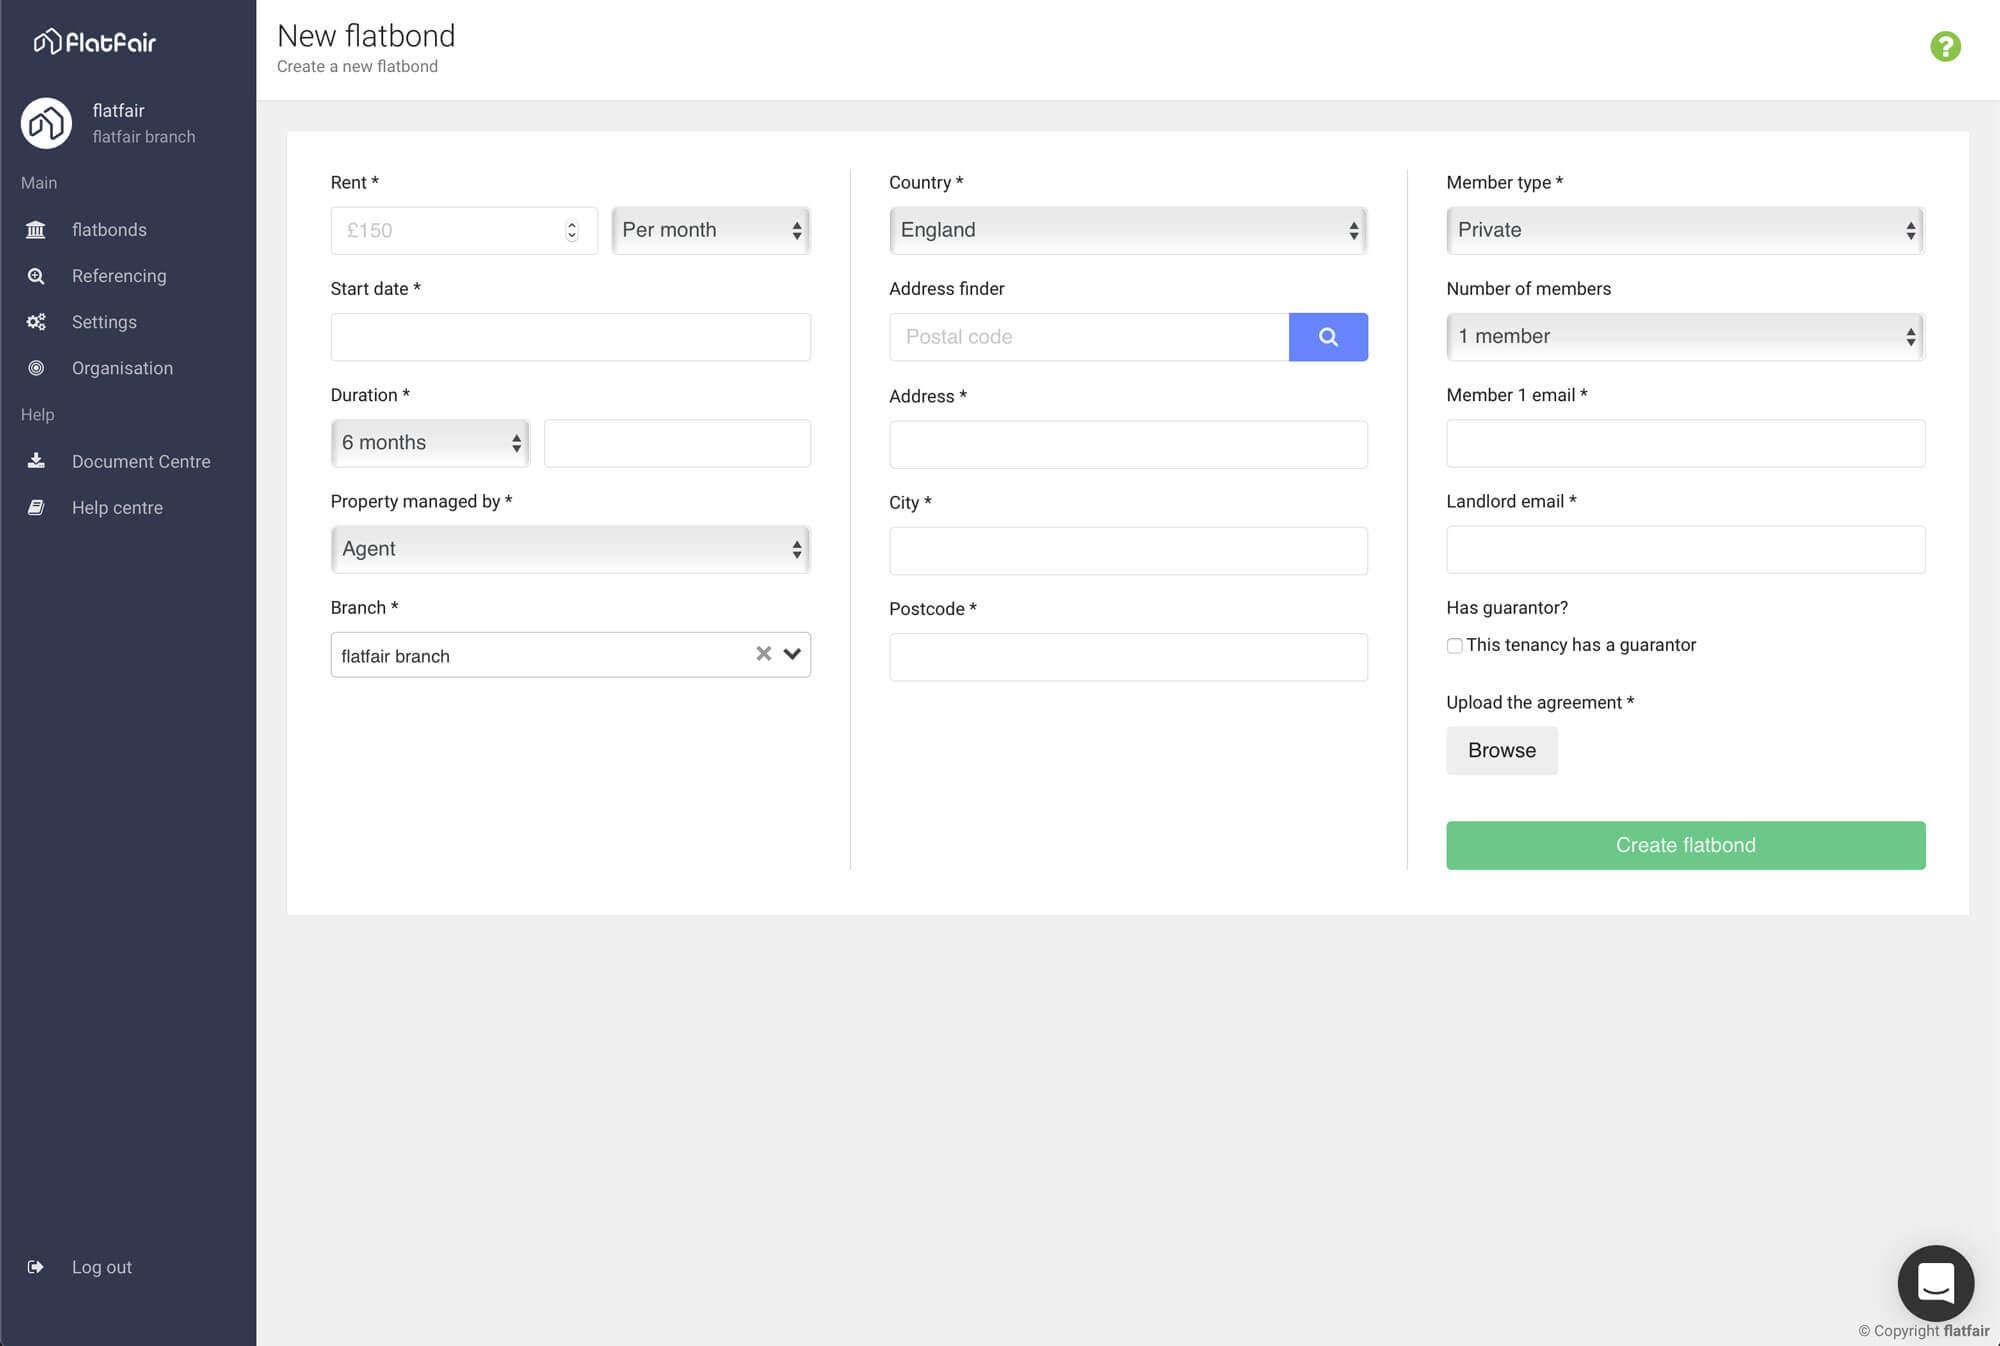 flatfair New flatbond screenshot